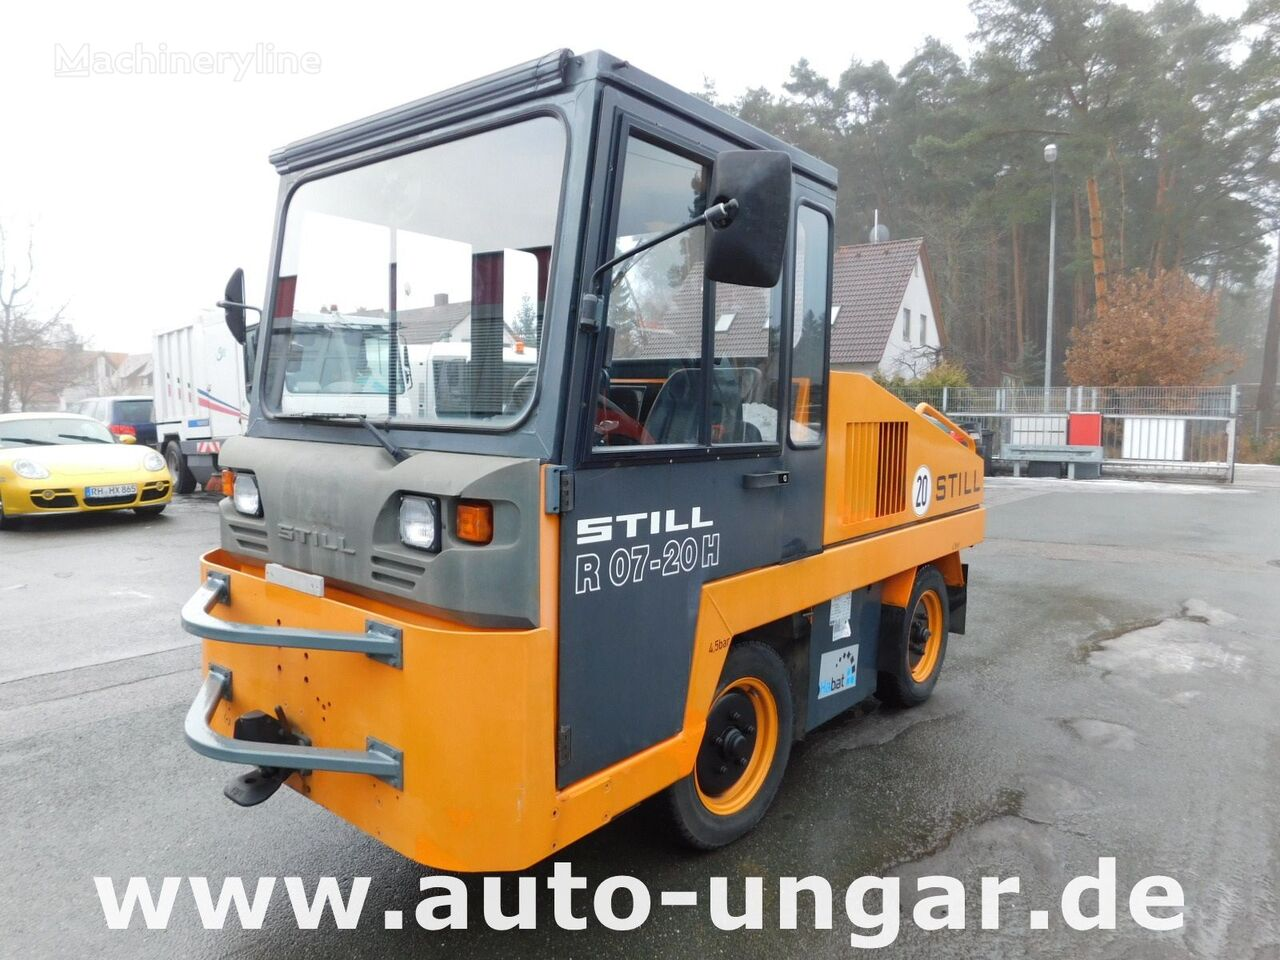 speciální tahač STILL R07-20H Hybrid Diesel - Elektro Schlepper Zugmaschine